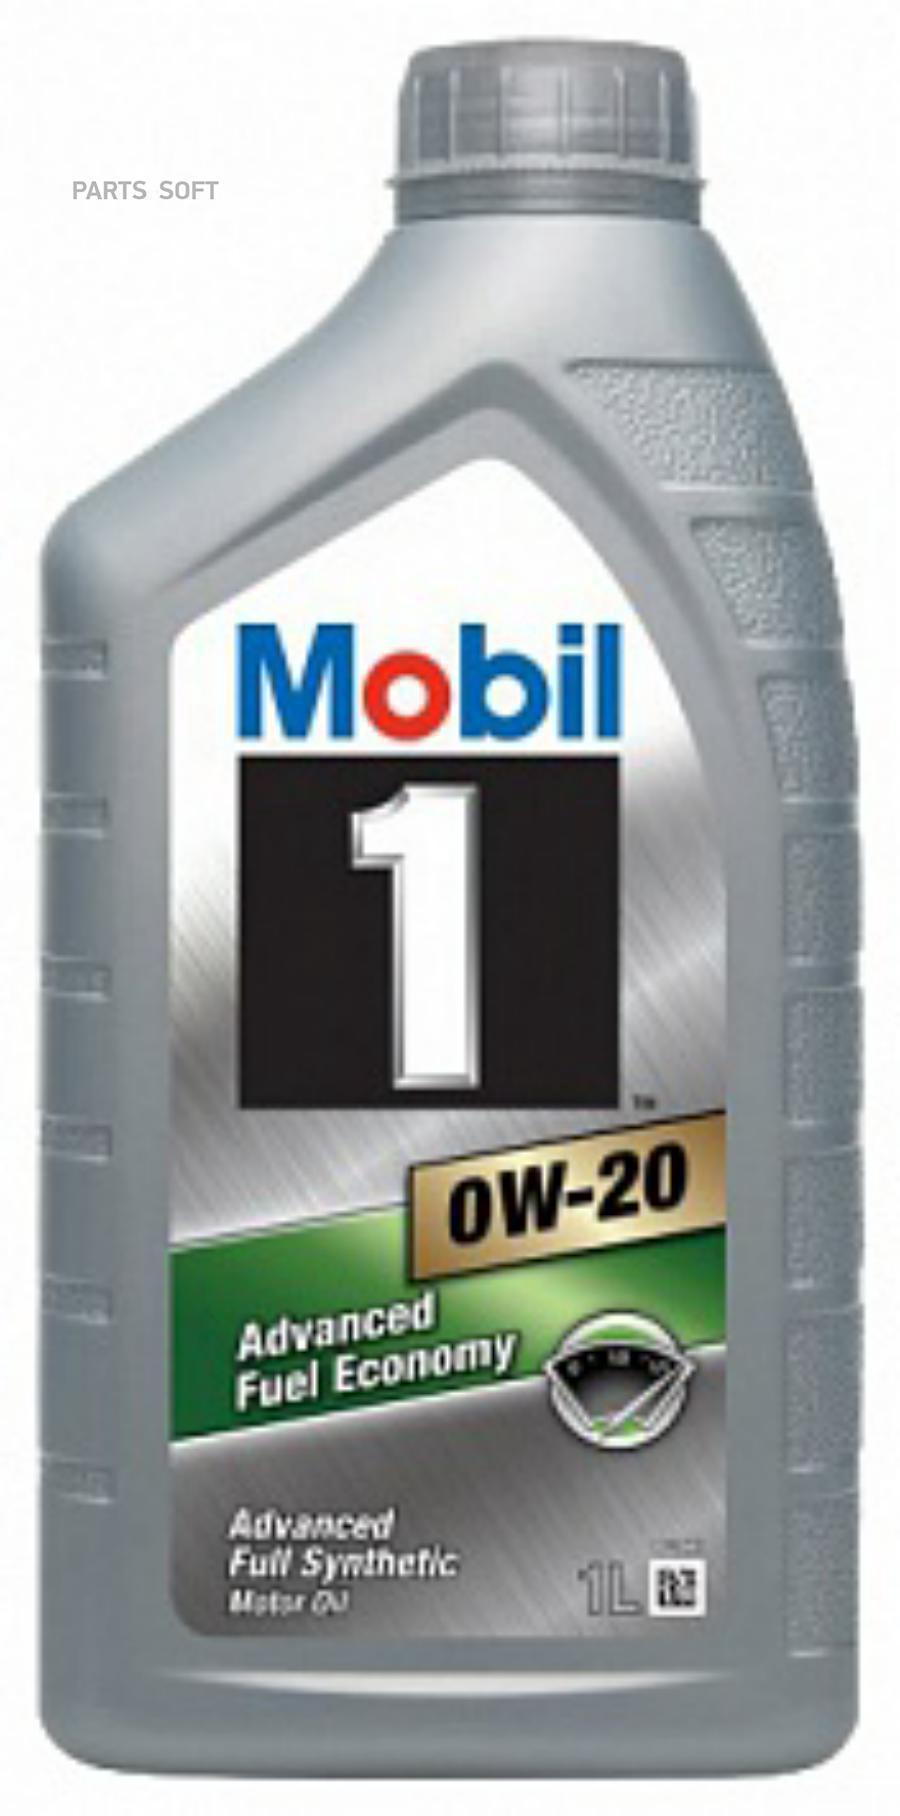 Масло моторное синтетическое Advanced Fuel Economy 0W-20, 1л